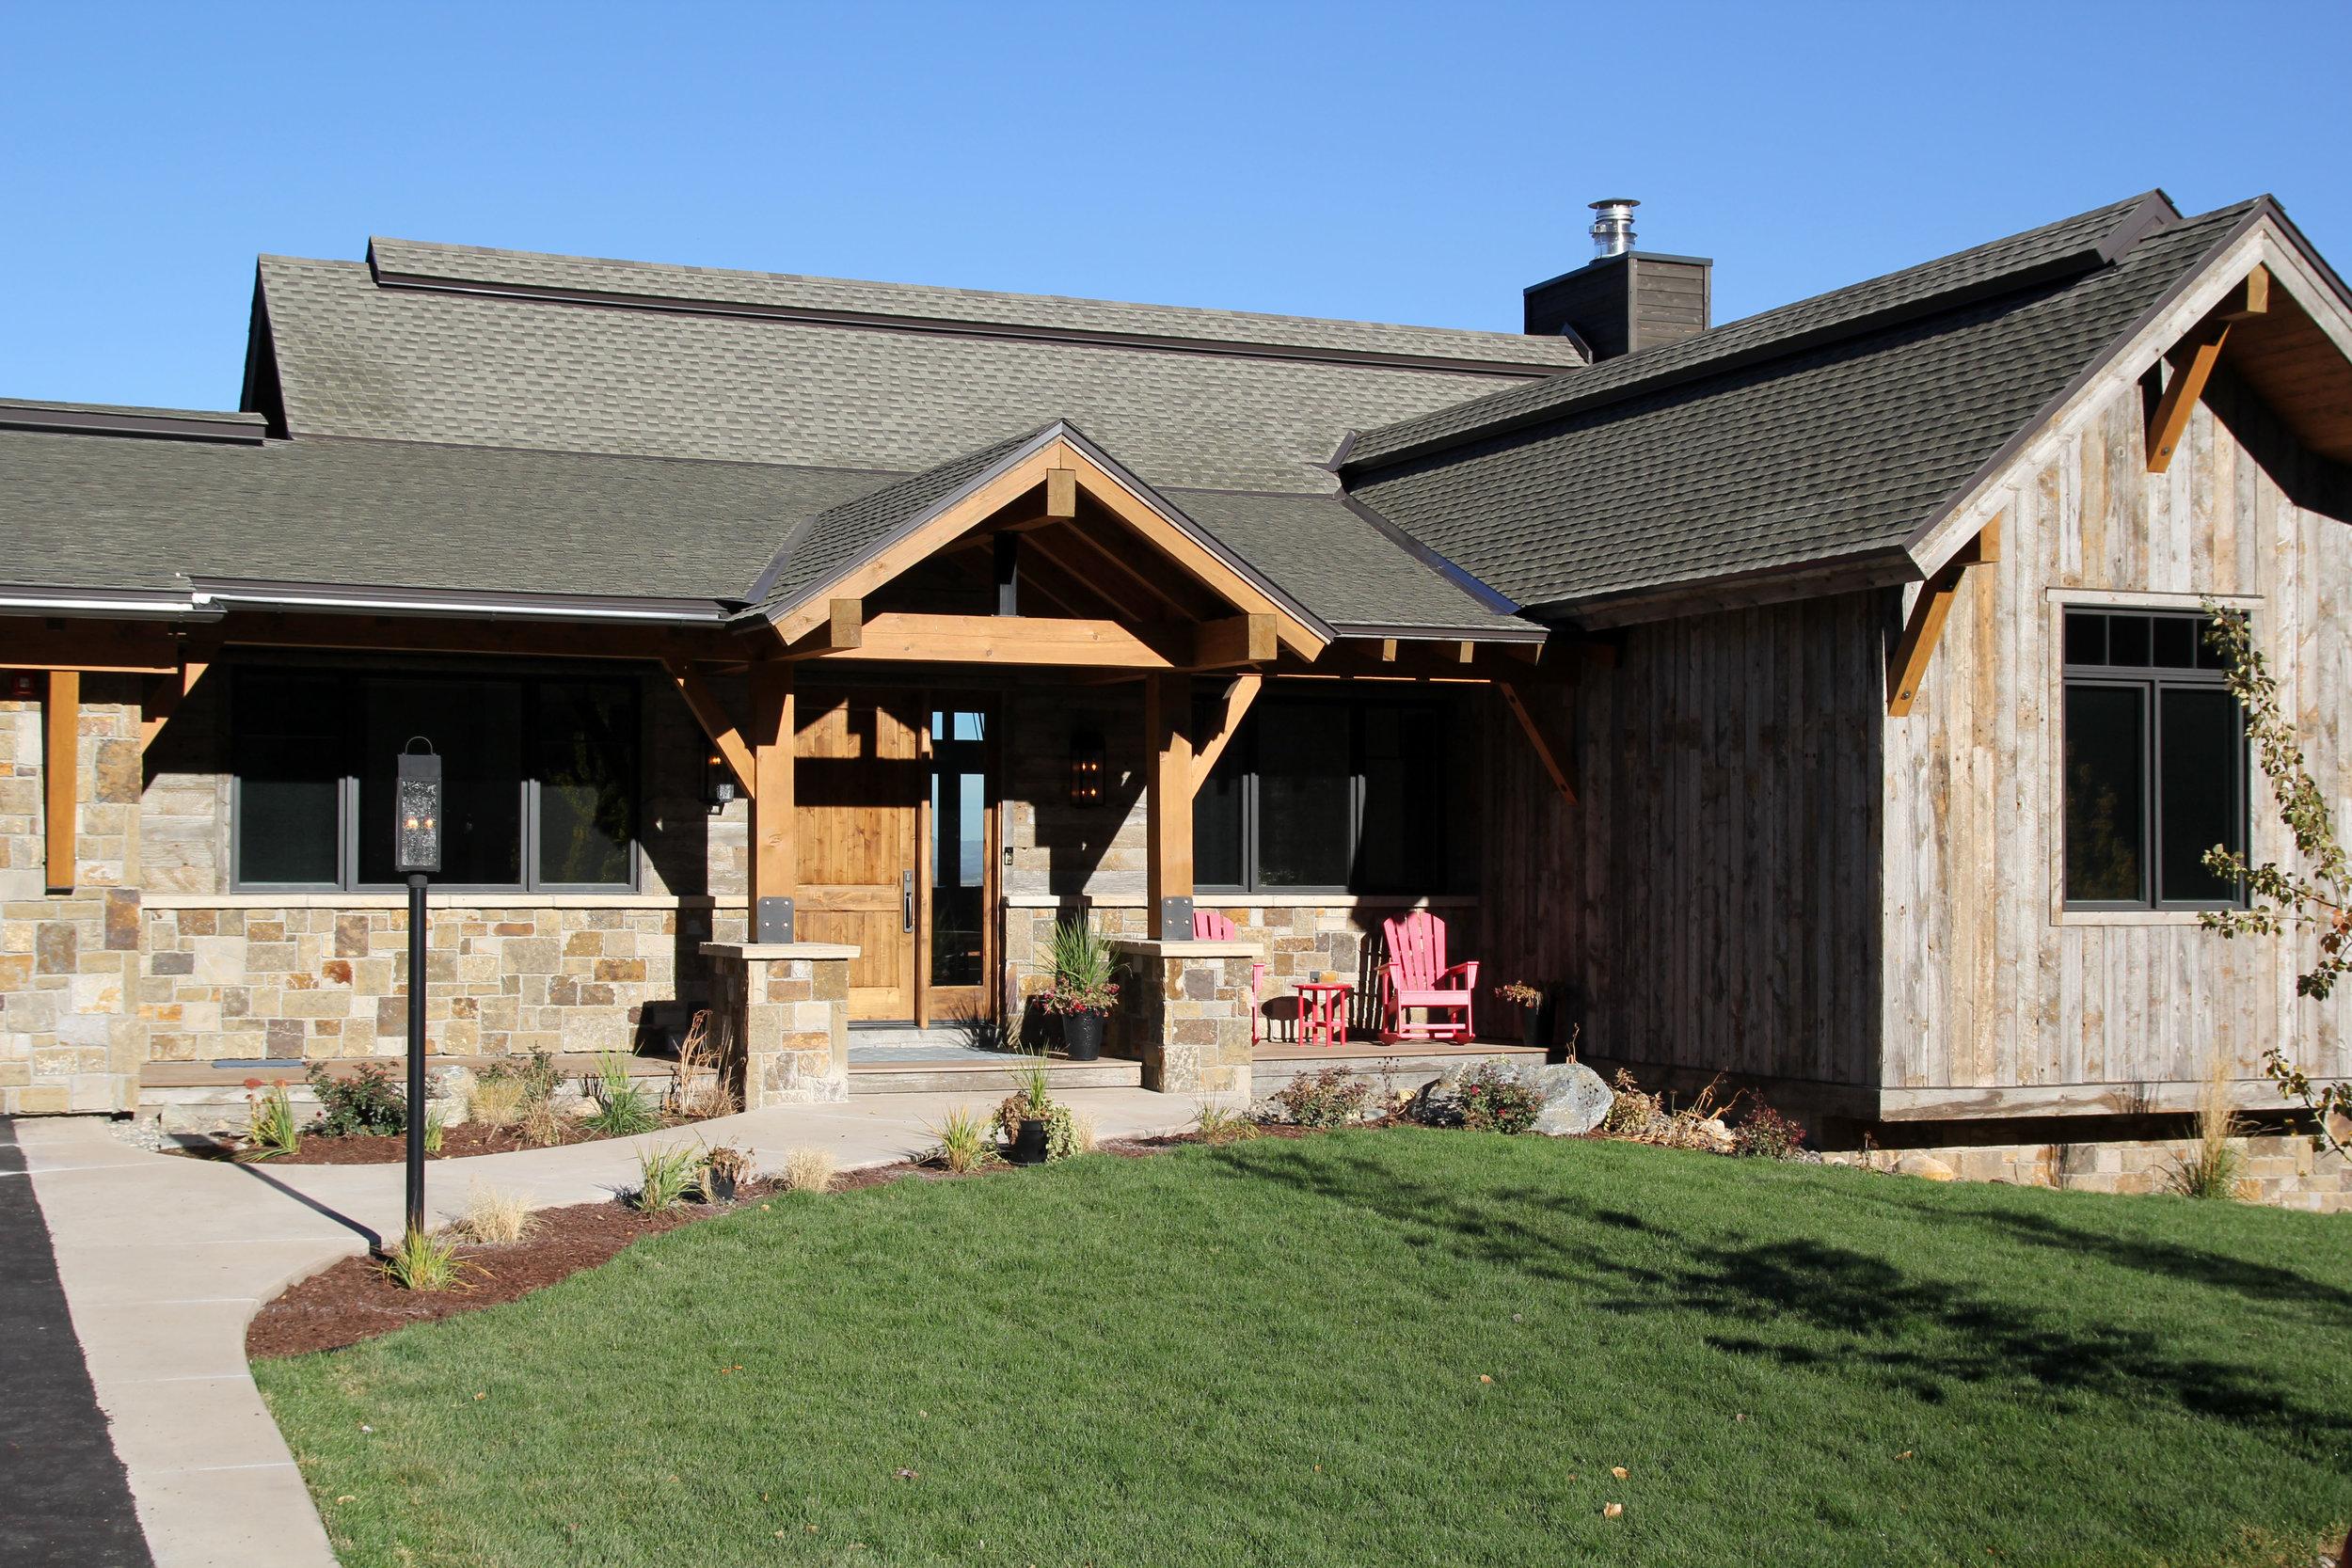 Colorado Residential Architect Sudol 5.jpg